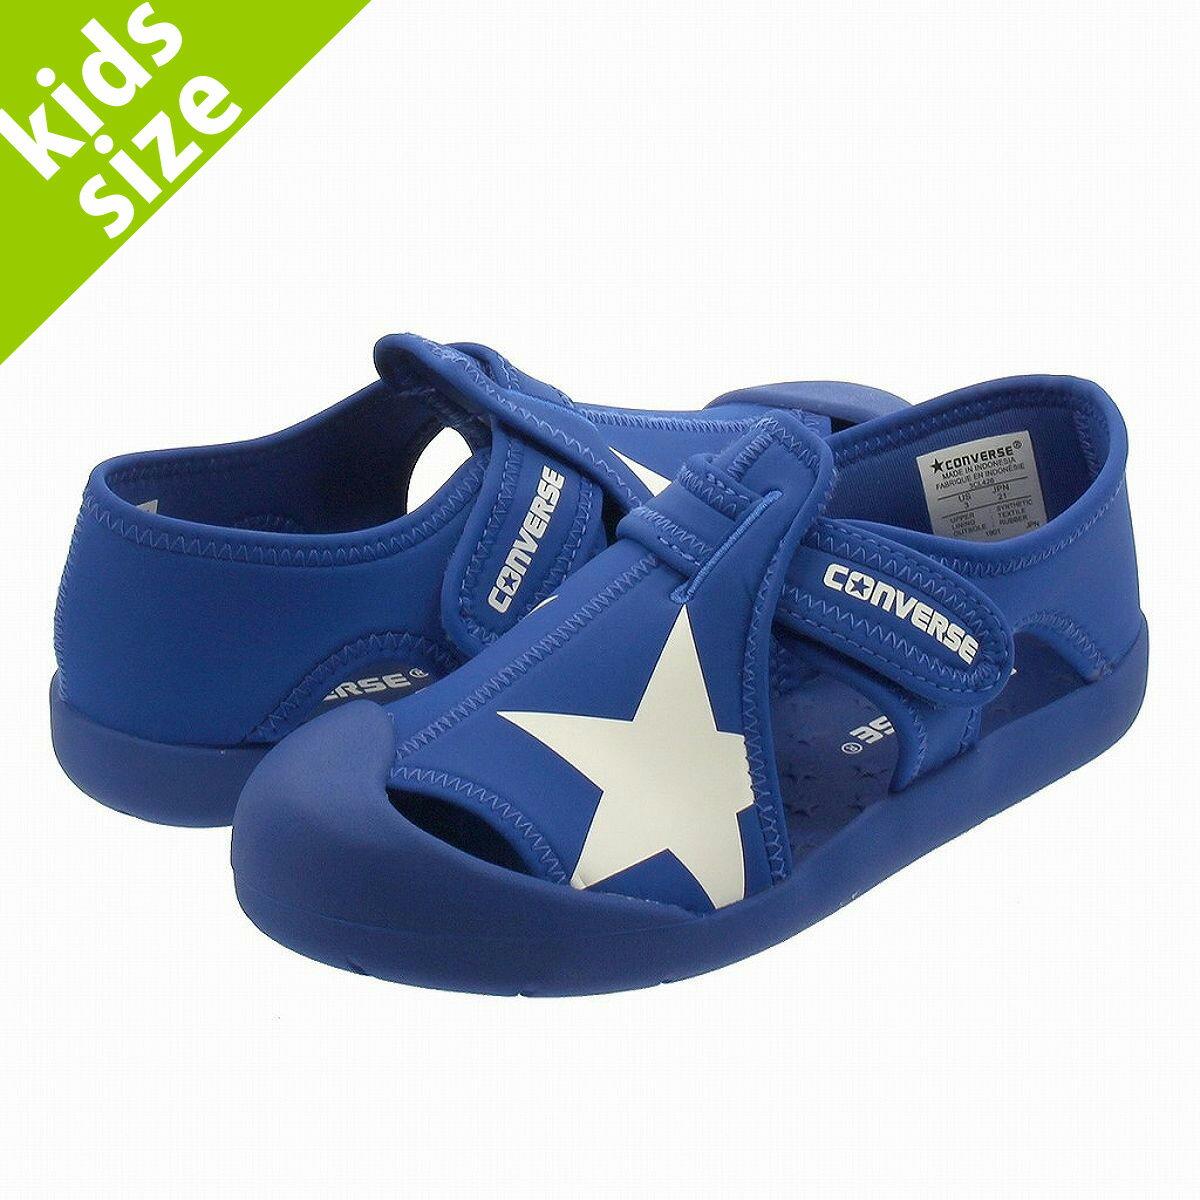 靴, サンダル SALE 16.022.0cm CONVERSE KIDS CVSTAR SANDAL CV BLUE 32713476